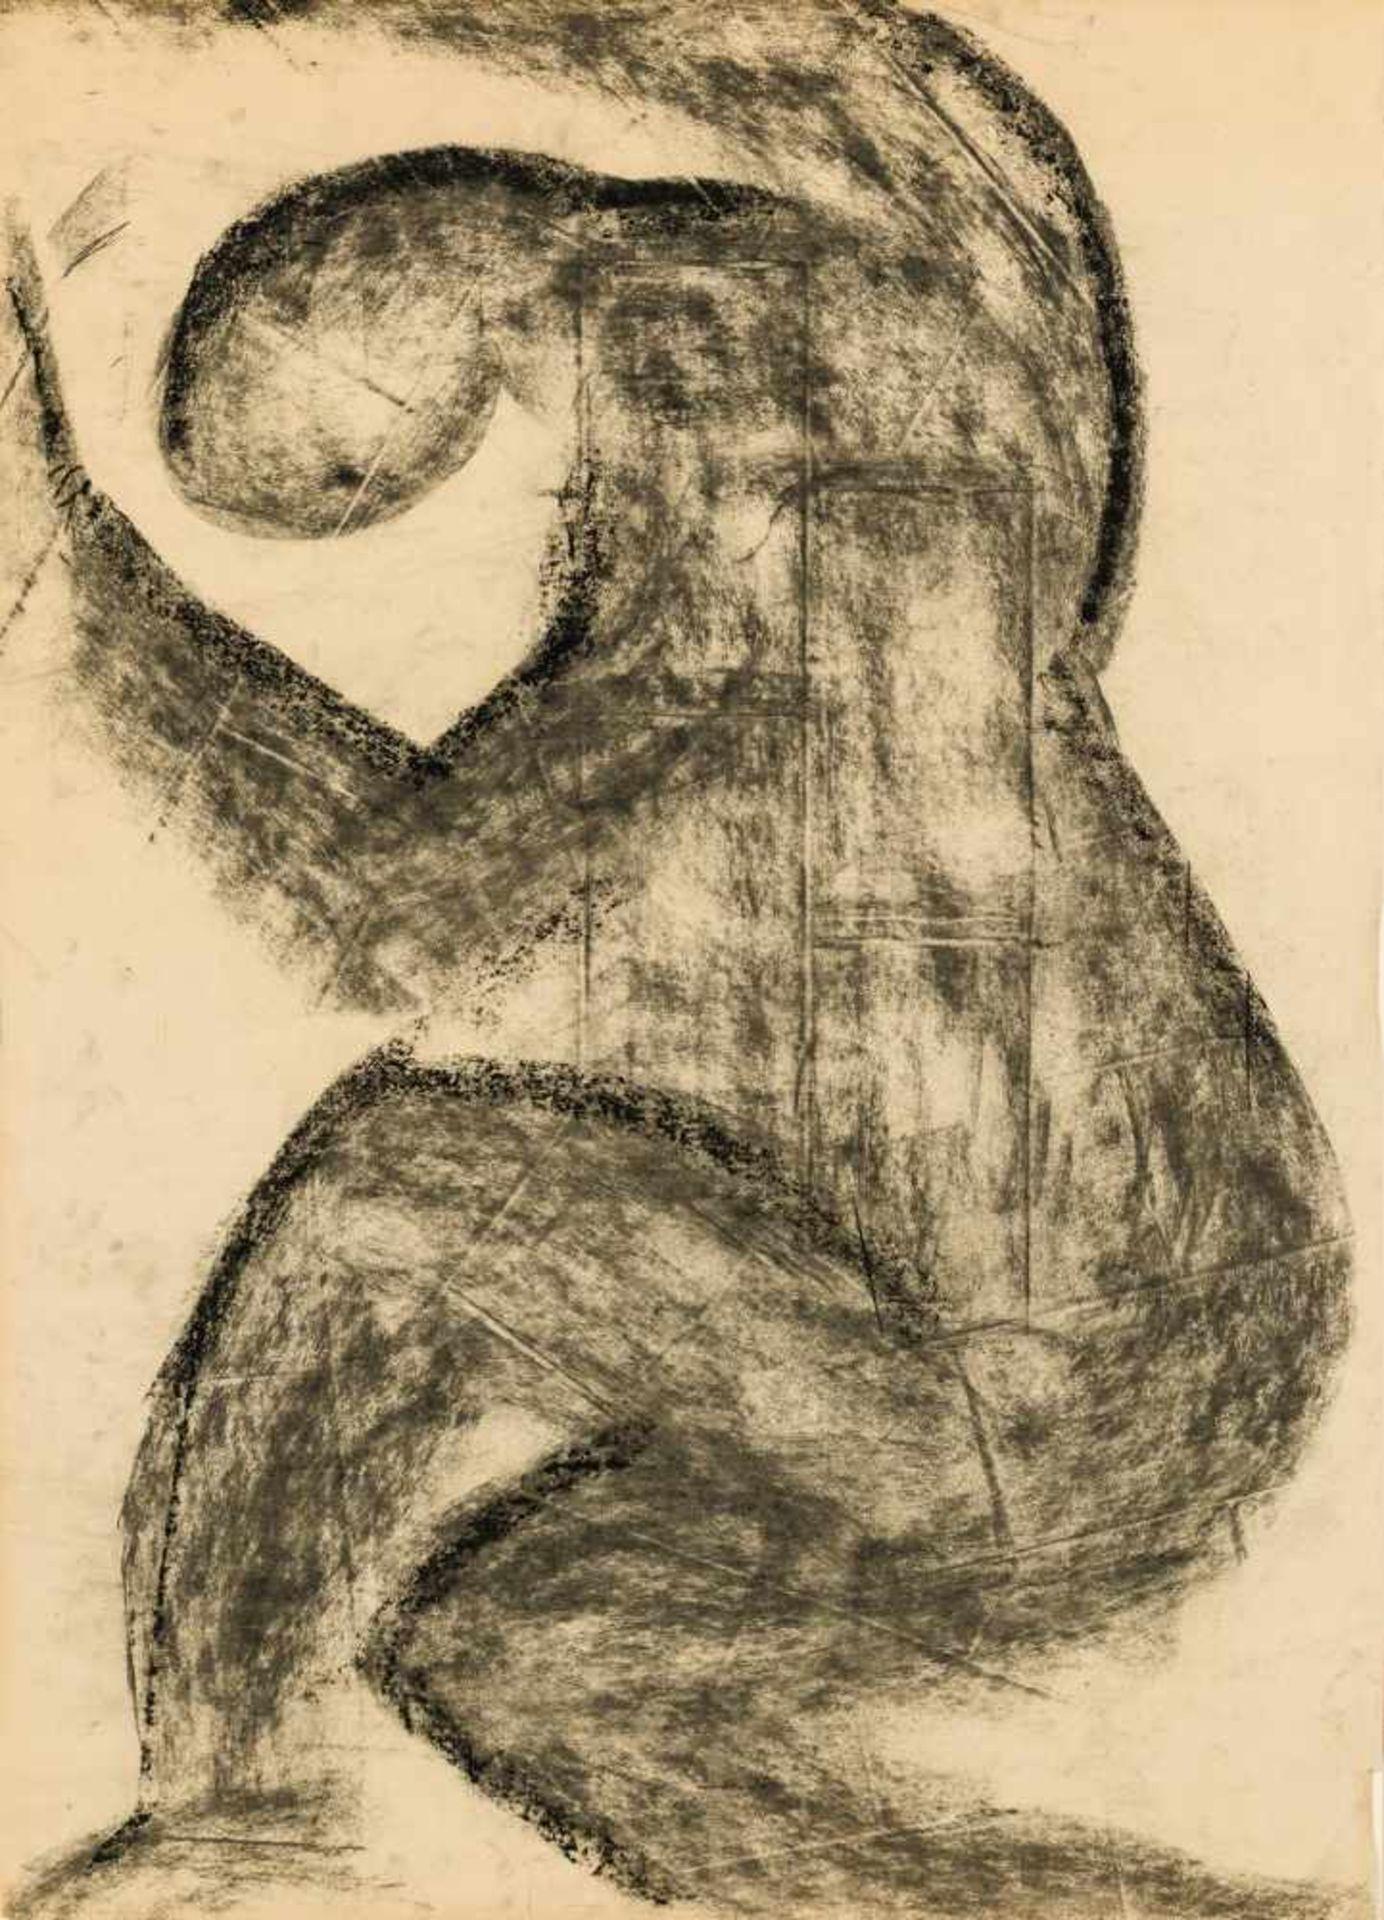 Los 58 - Peter Kogler Innsbruck 1959 geb. Ohne Titel (Figur) Kreide auf Papier 86 x 61 cm 1984 rückseitig